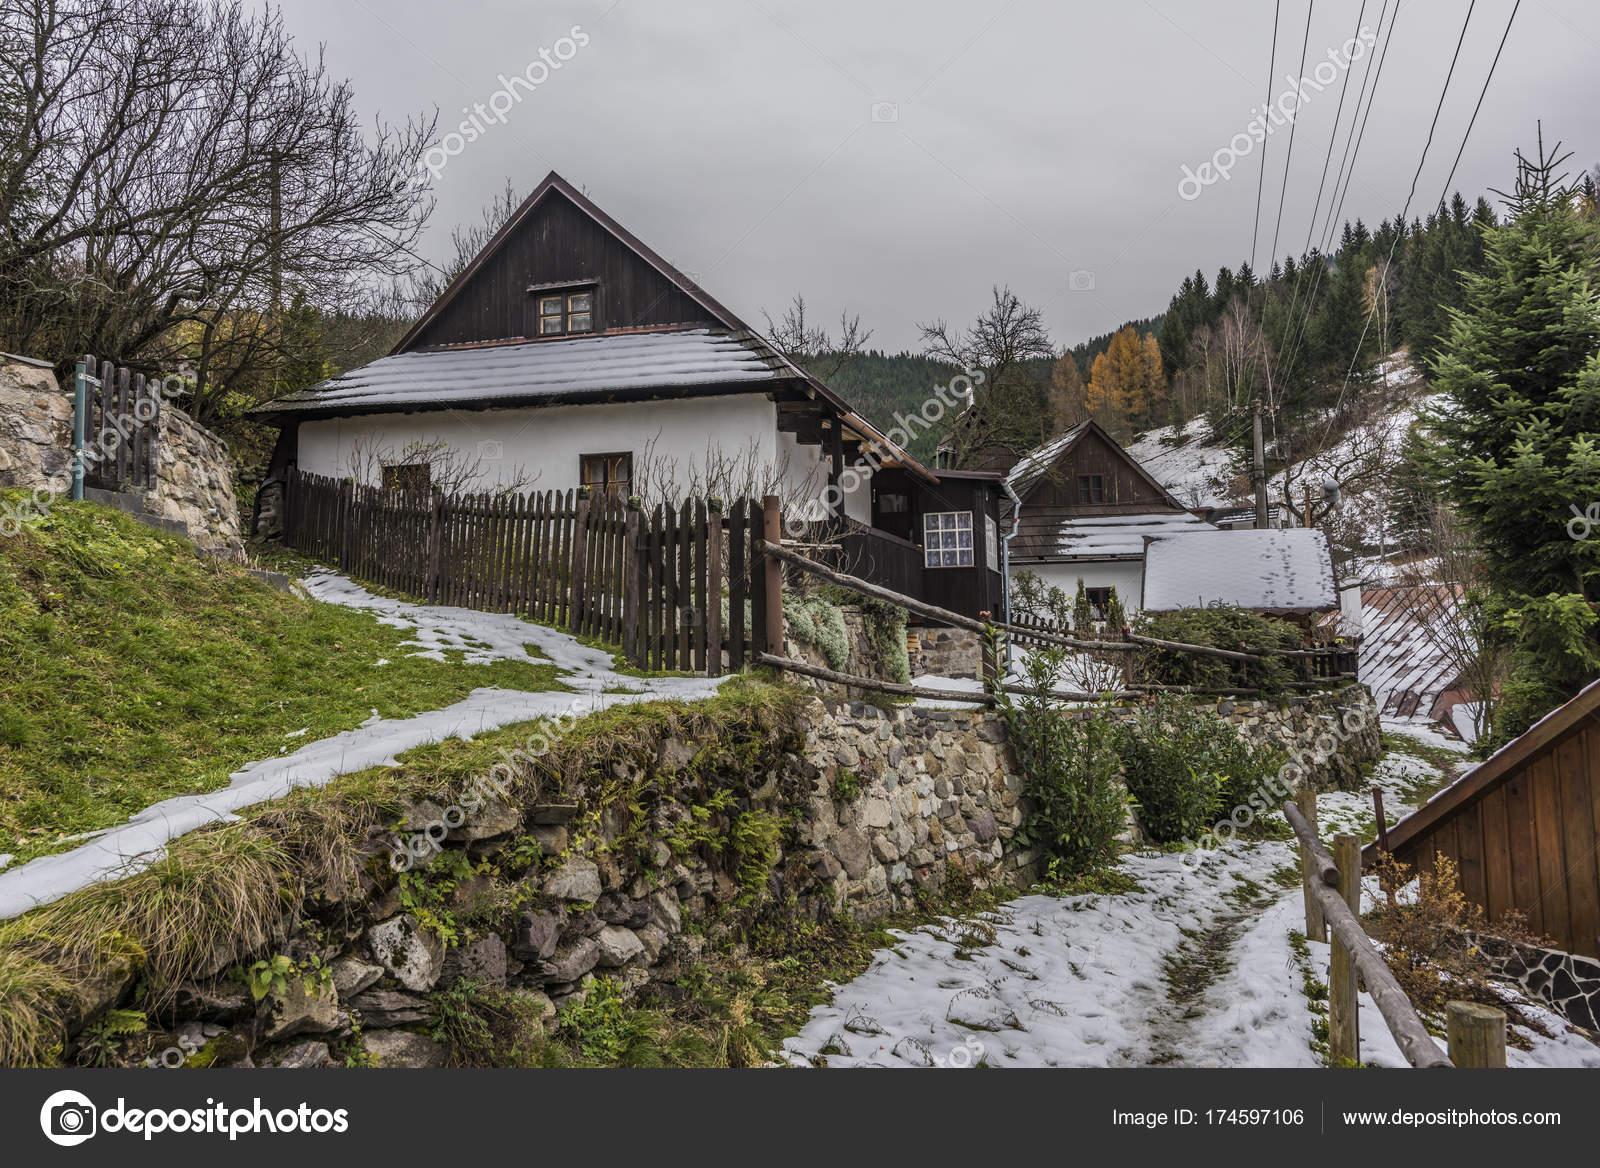 e6629c84f45 ΣΠΑΝΙΑ Dolina χωριό στο σκοτεινό κρύα ημέρα του φθινοπώρου ...